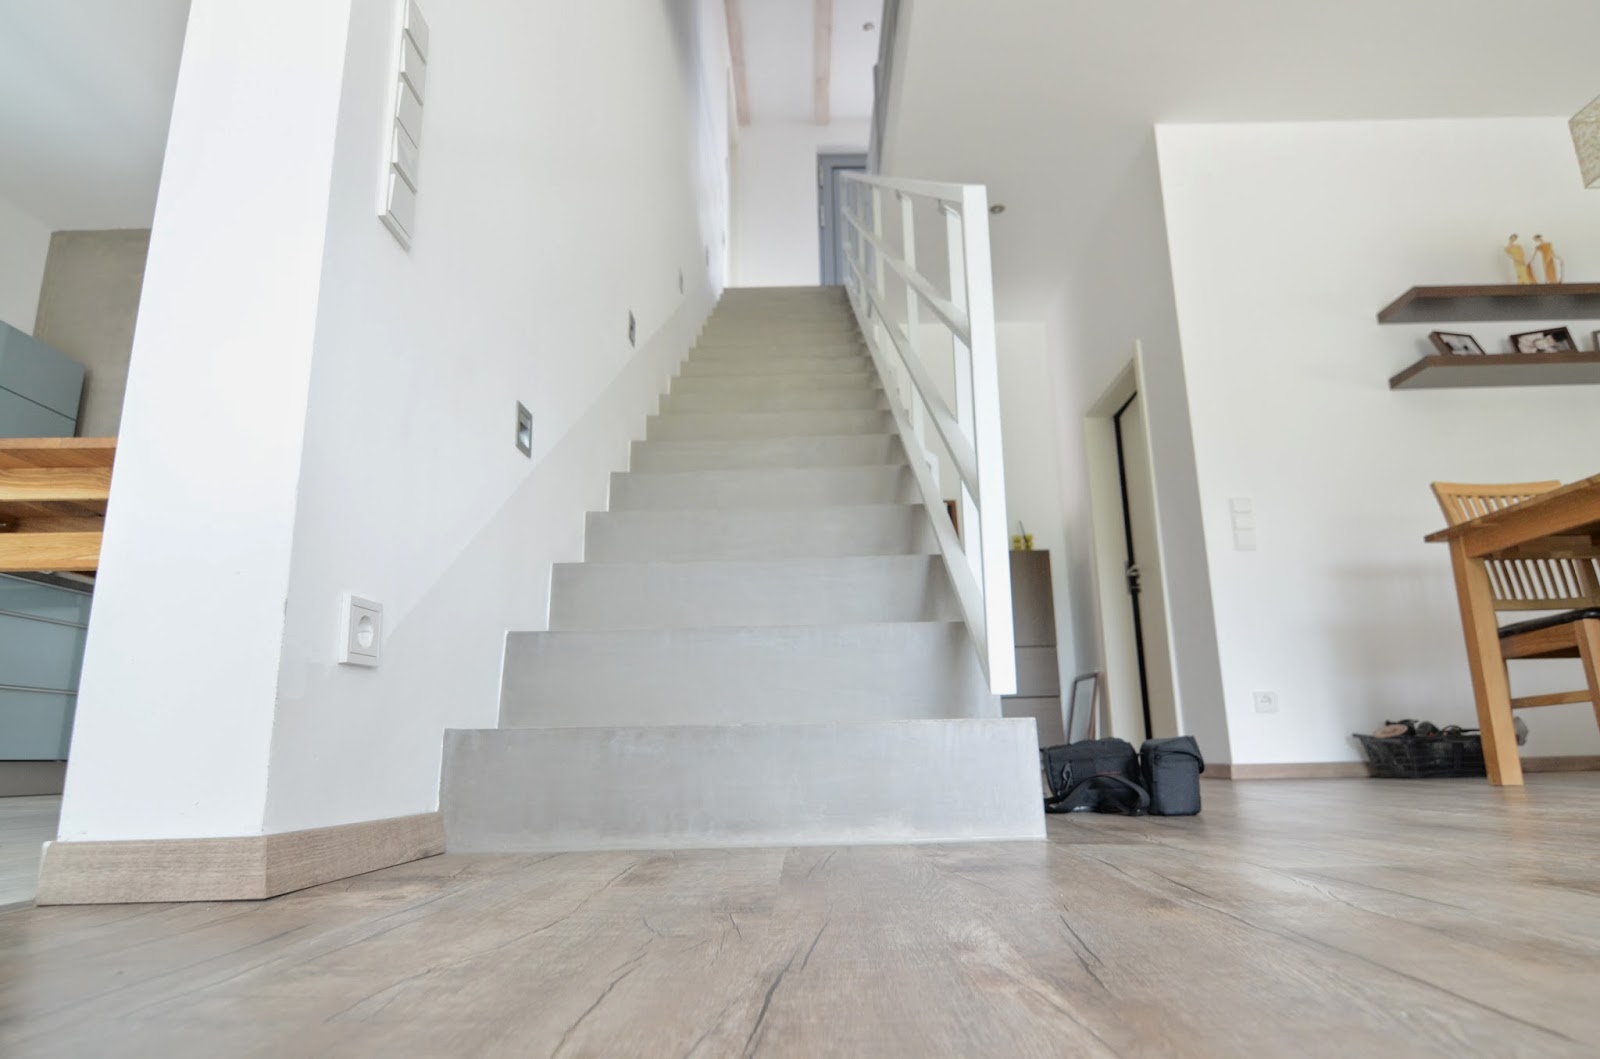 Betontreppe Innen beton cire oberflächen in beton look betontreppe l beton cire l